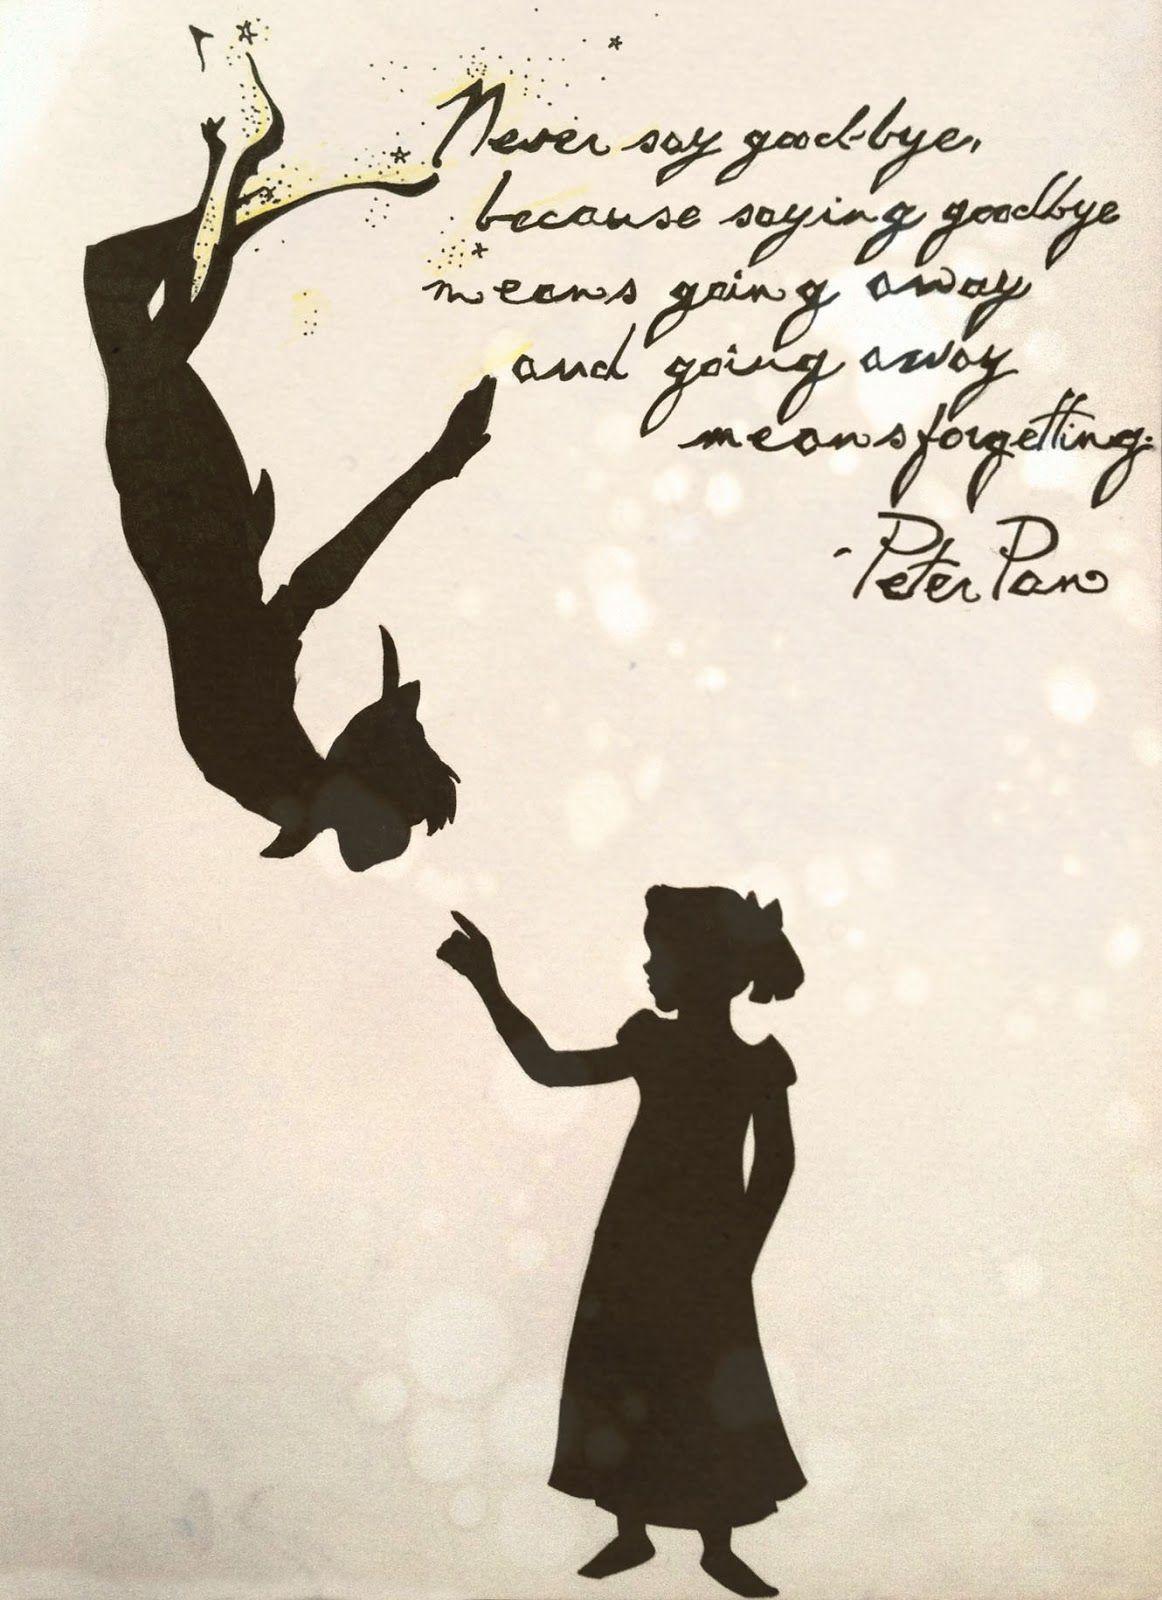 X files iphone wallpaper tumblr - Peter Pan Tattoo Peter Pan Tattoos Images